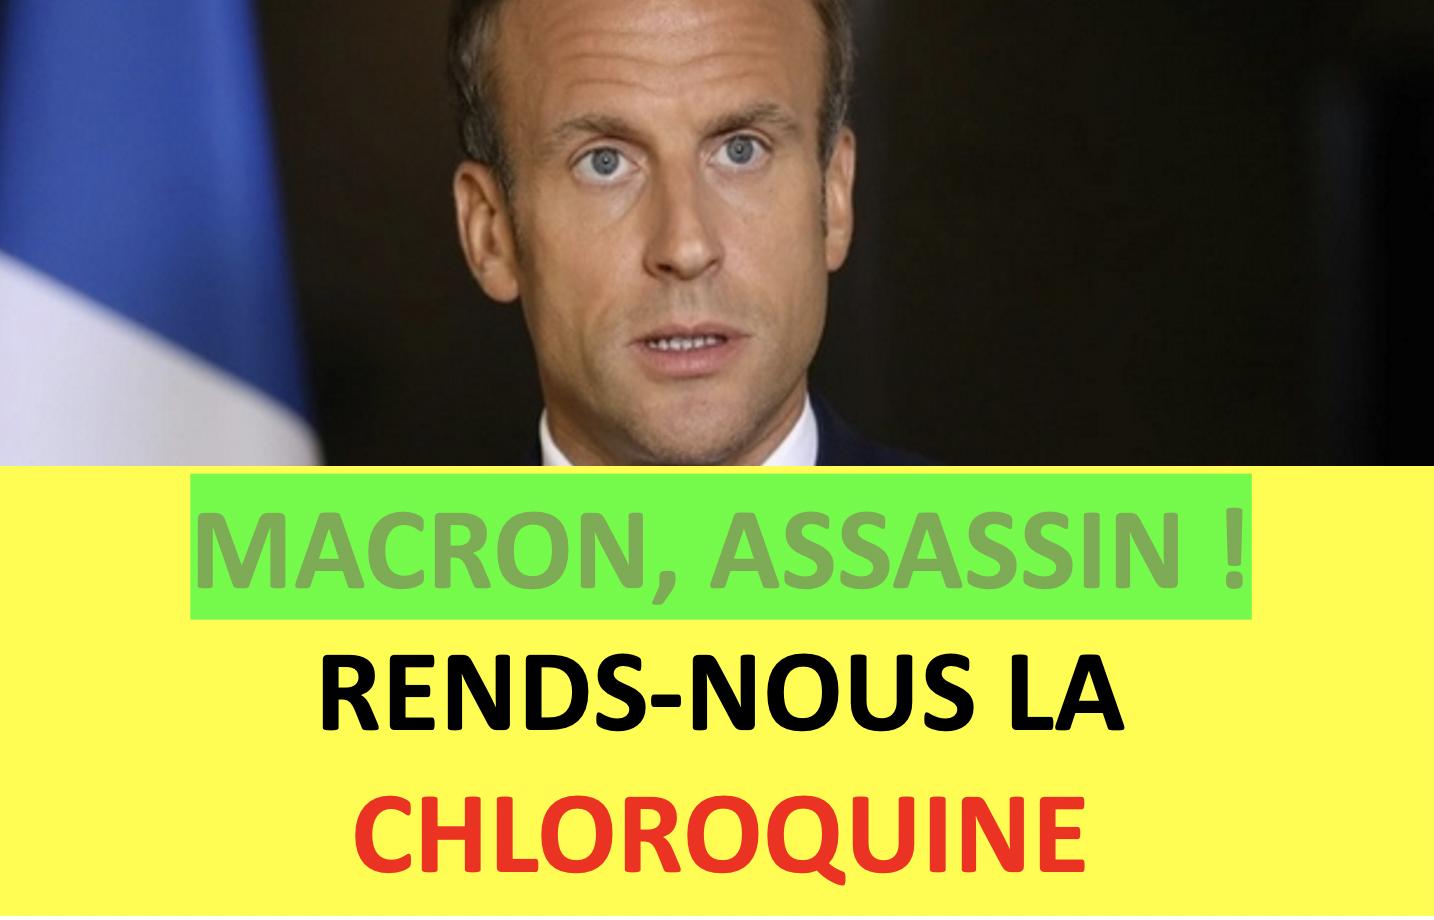 Macron, assassin, rends-nous la chloroquine ! #macronassassin